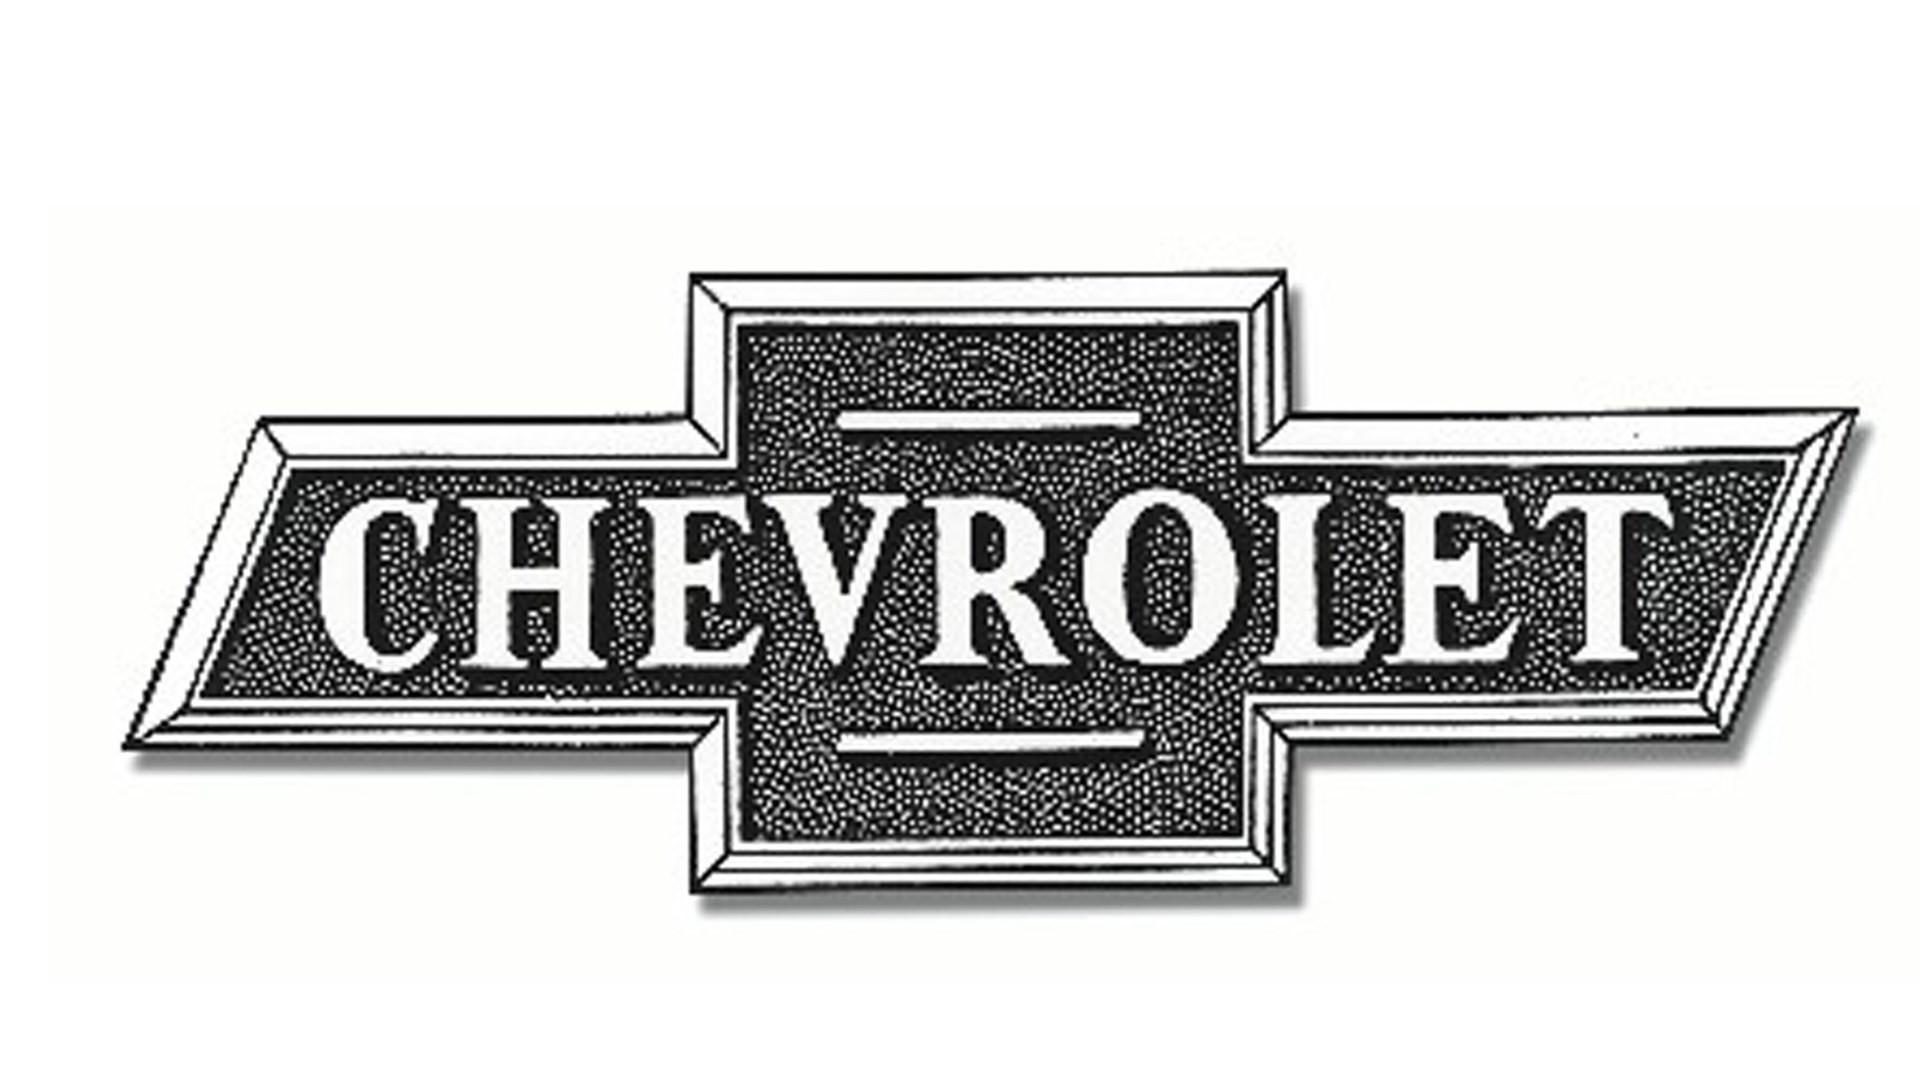 Chevy Logo Wallpaper Wallpapertag